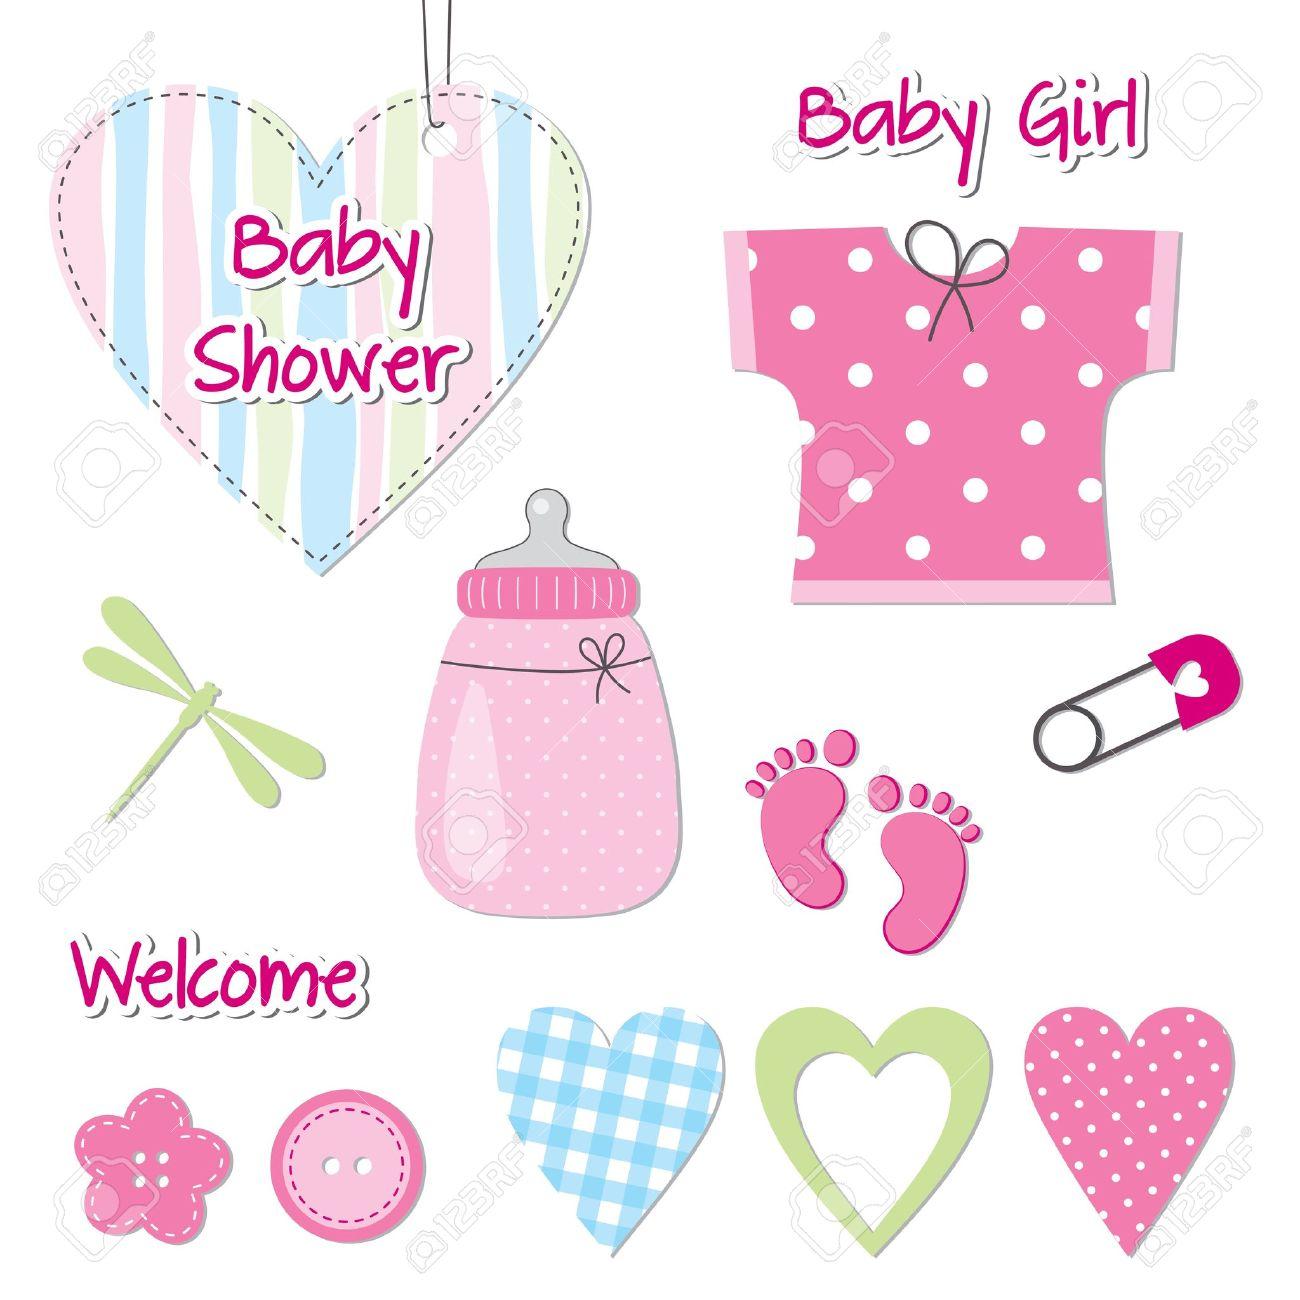 Baby girl shower card - scrapbook design elements - 21863592